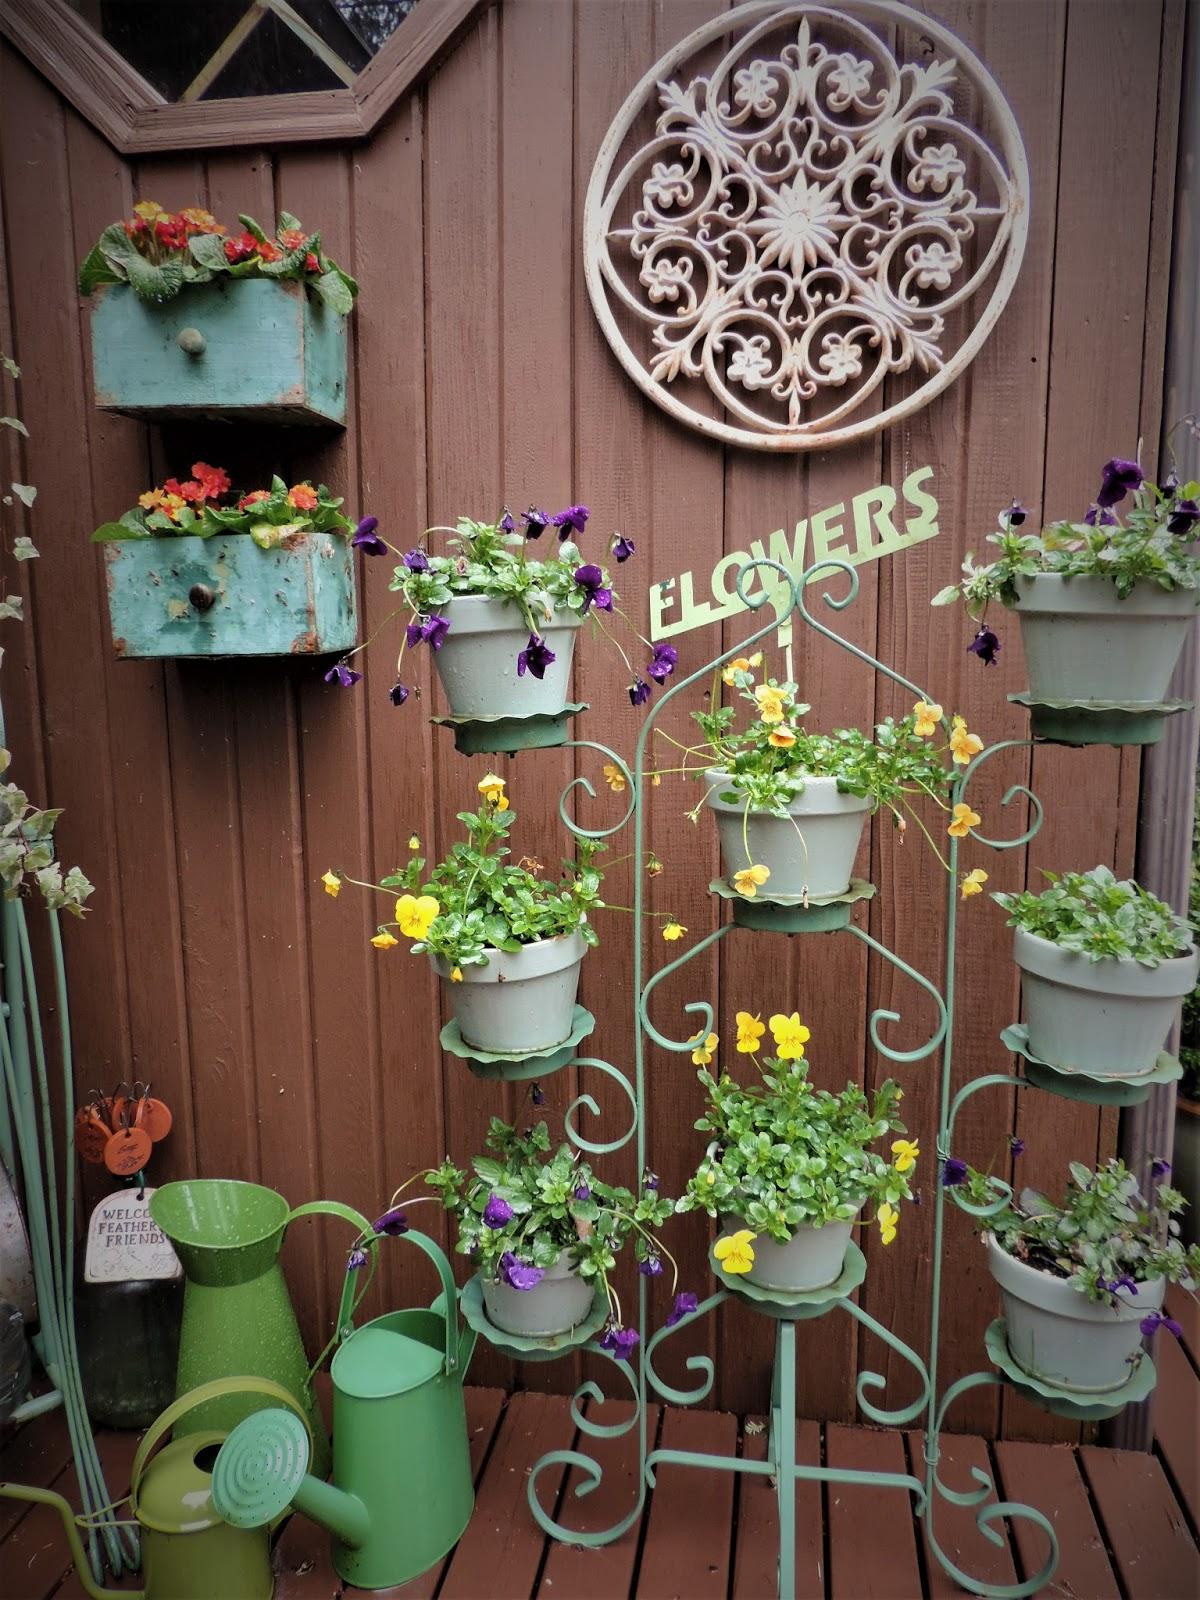 Beatrice Euphemie: Flowers on a Rainy Day